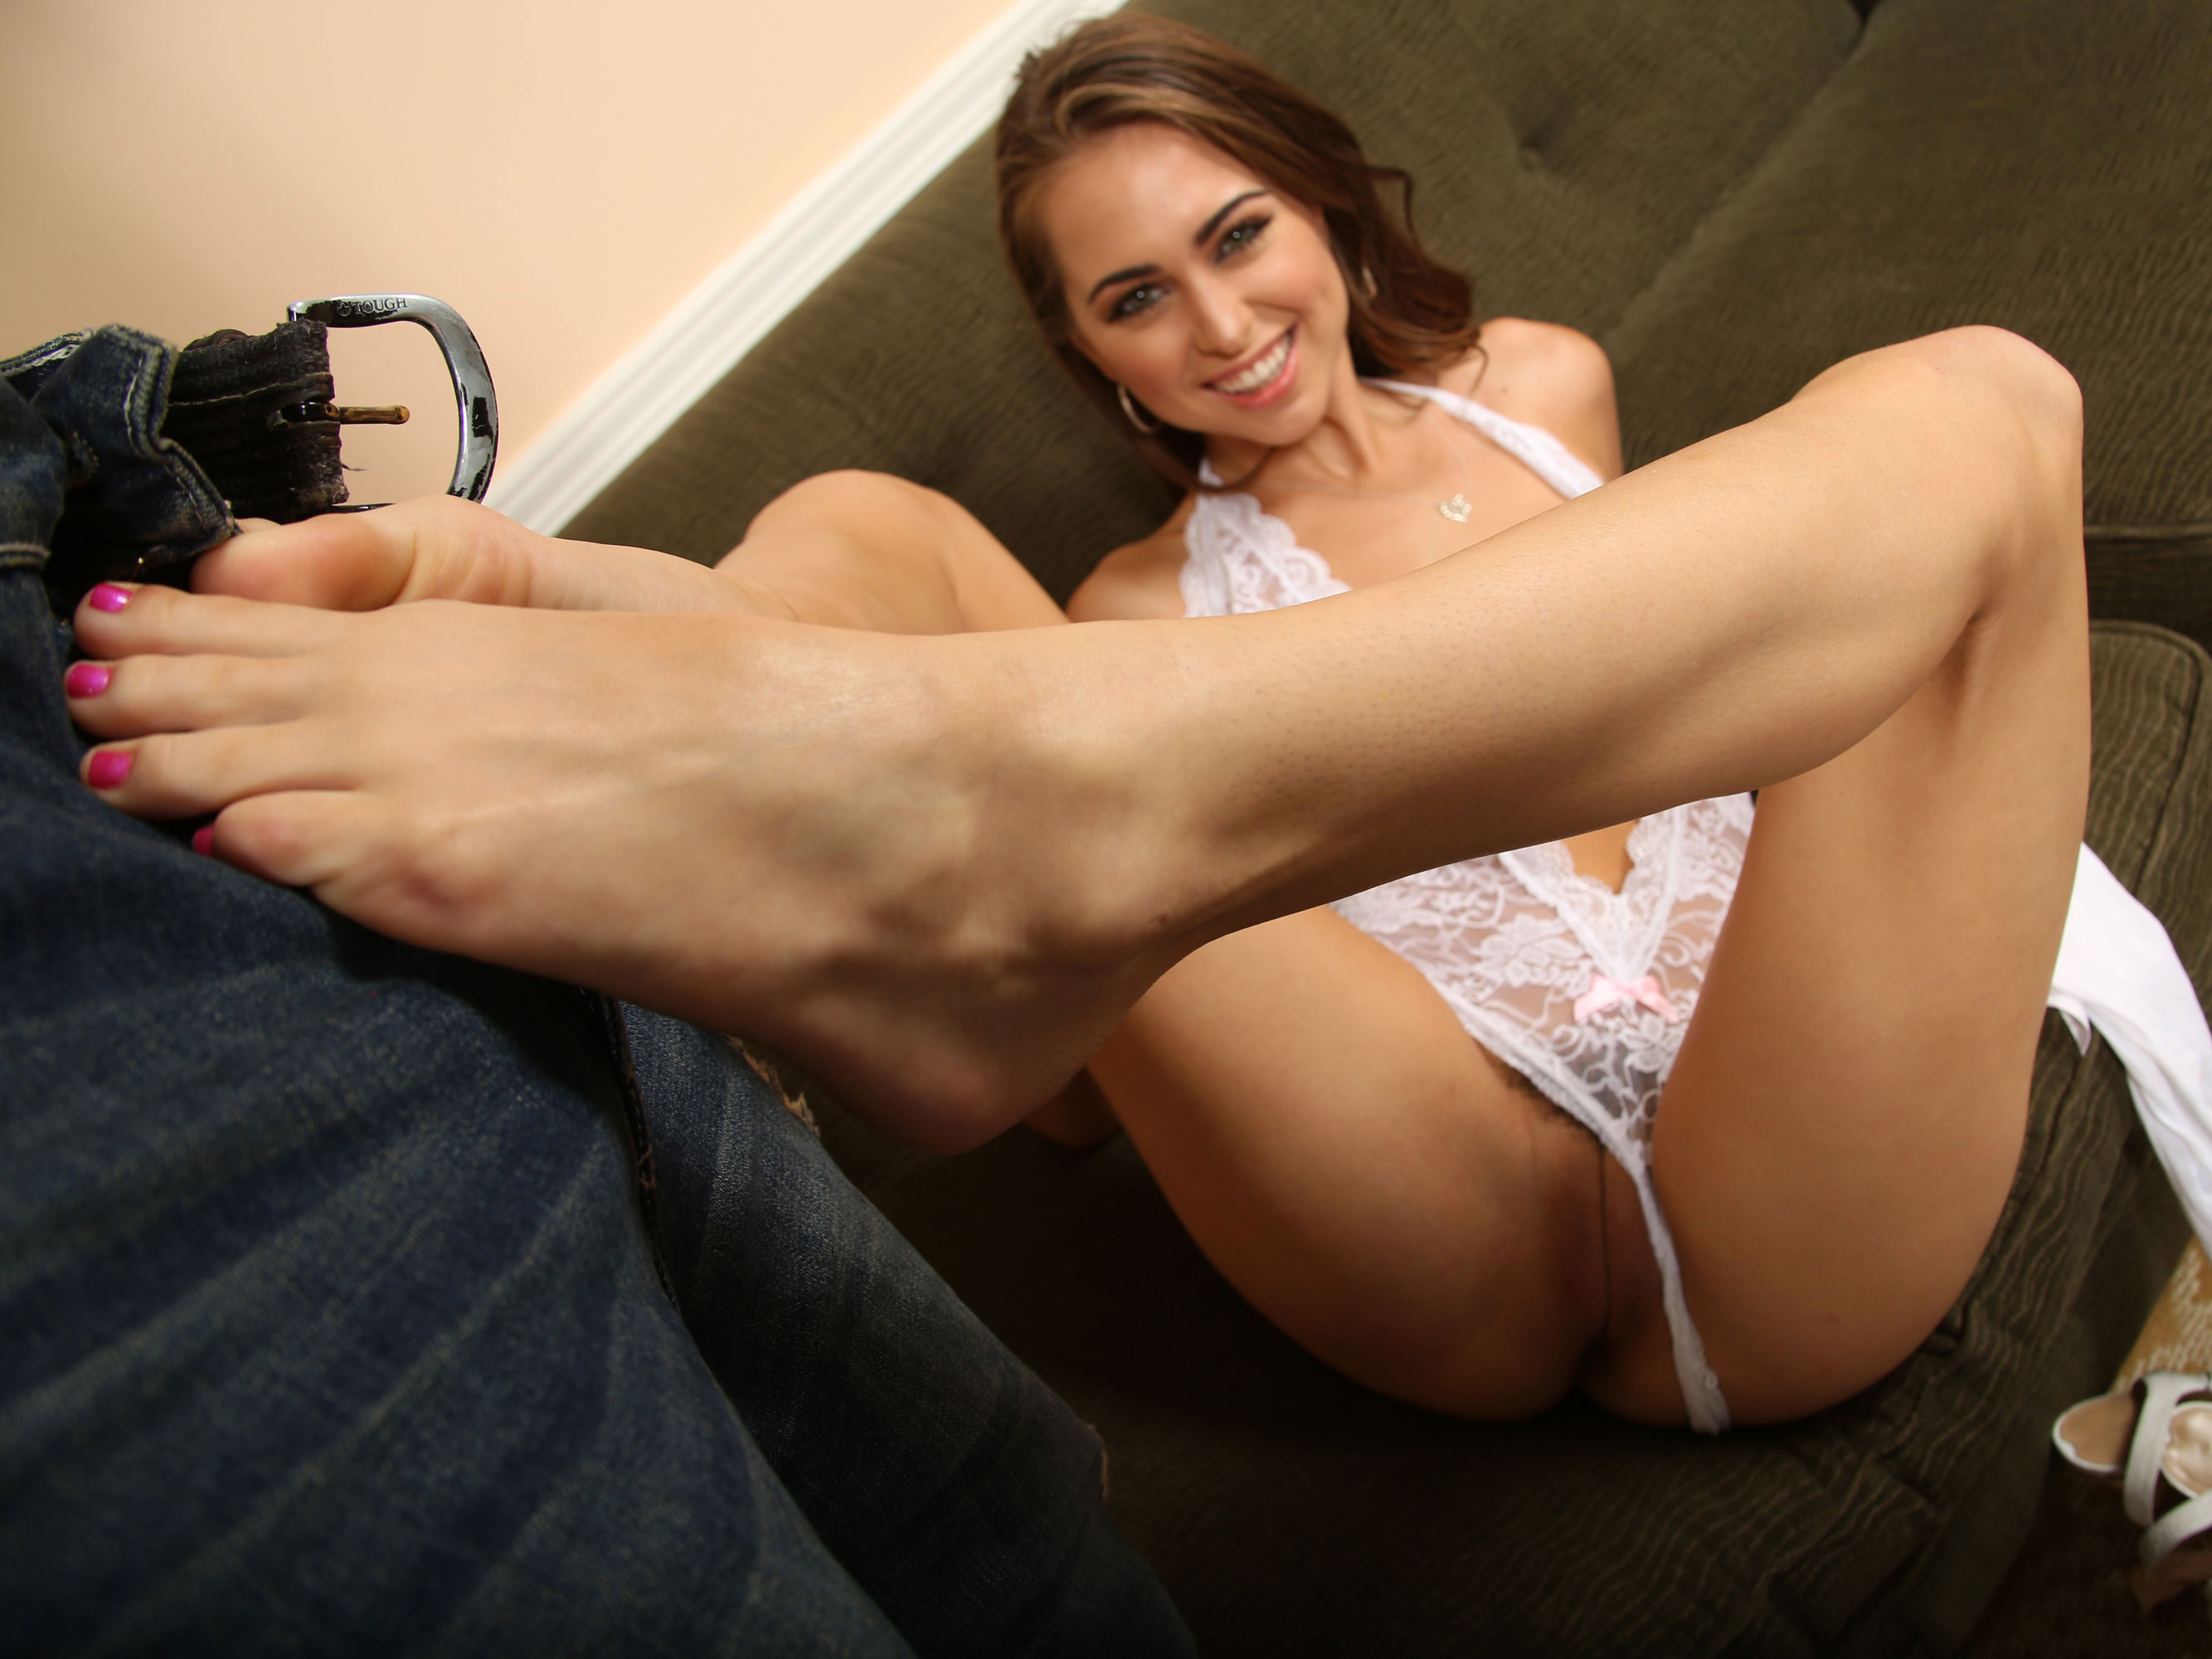 Sexy Footjob Big Penis - Riley Reid pleasing black cock with her feet